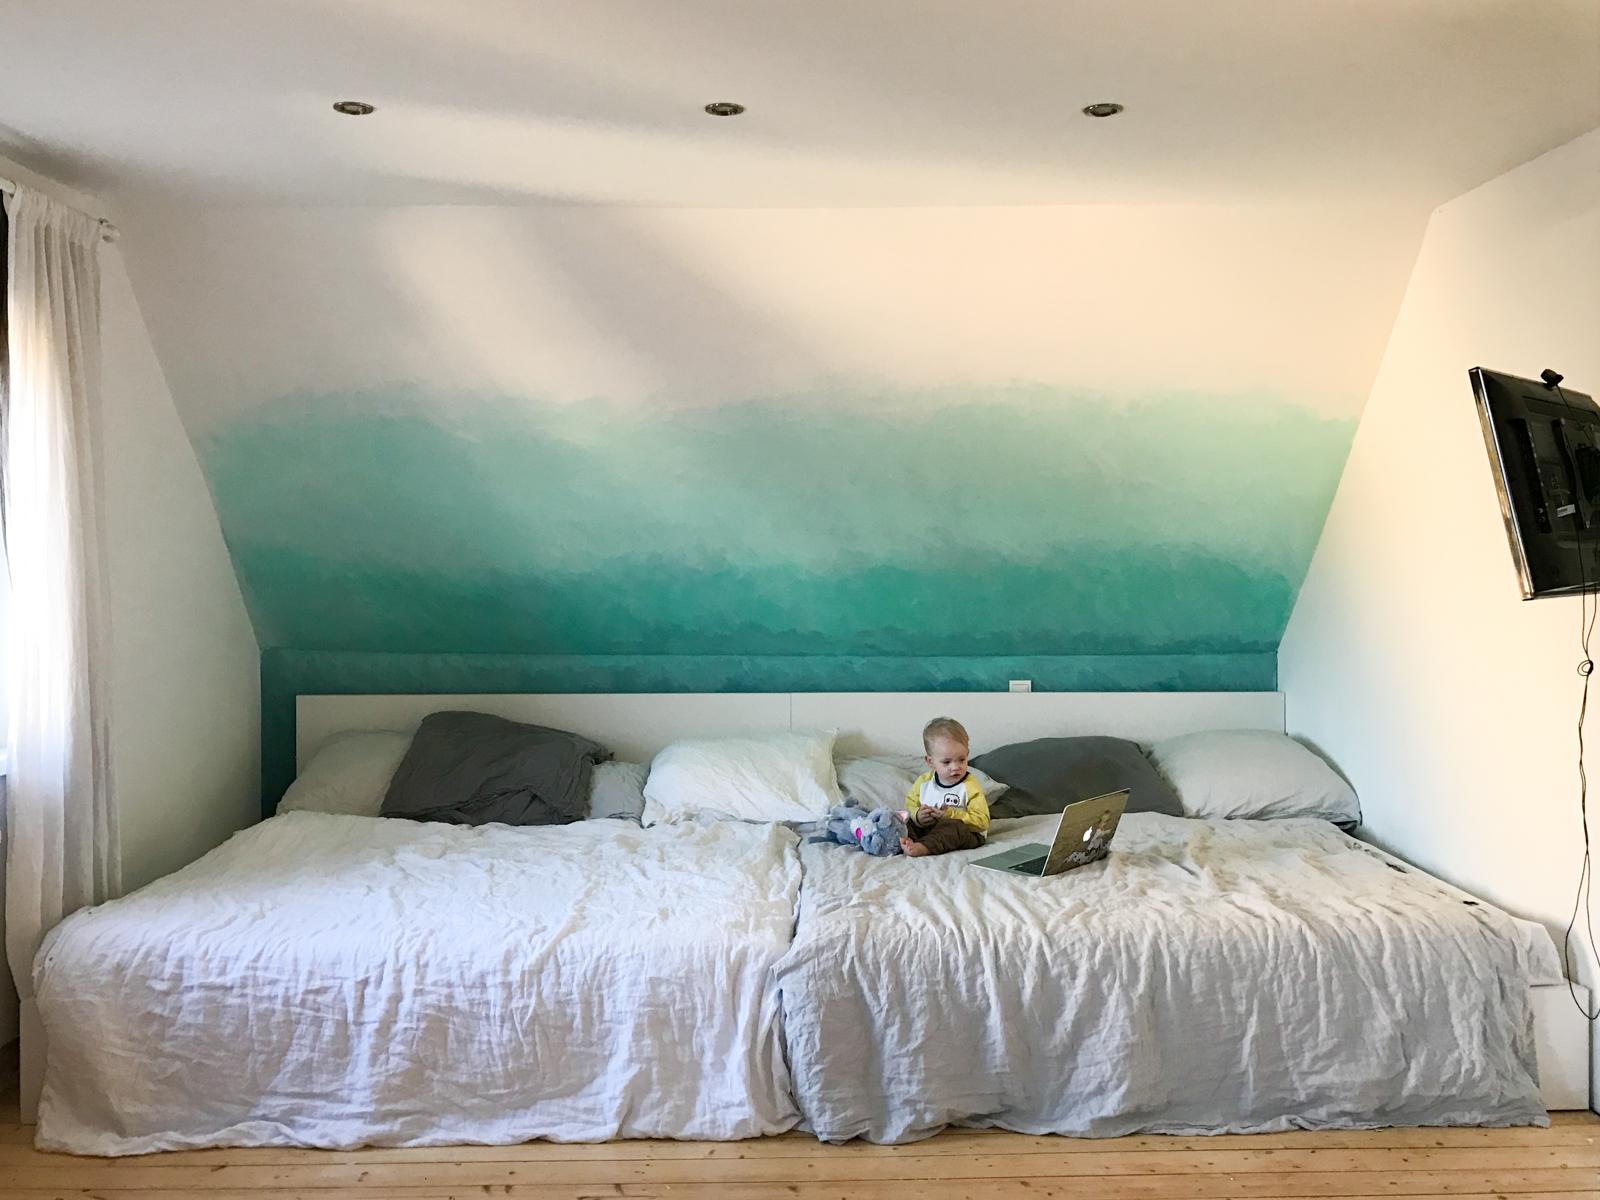 Xxl Familienbett Ikea Familybed Cosleeping Coschlafen Emma Matratze Home24  Großes Bett Kuscheln Familienbett Trendshock Riesig Riesiges